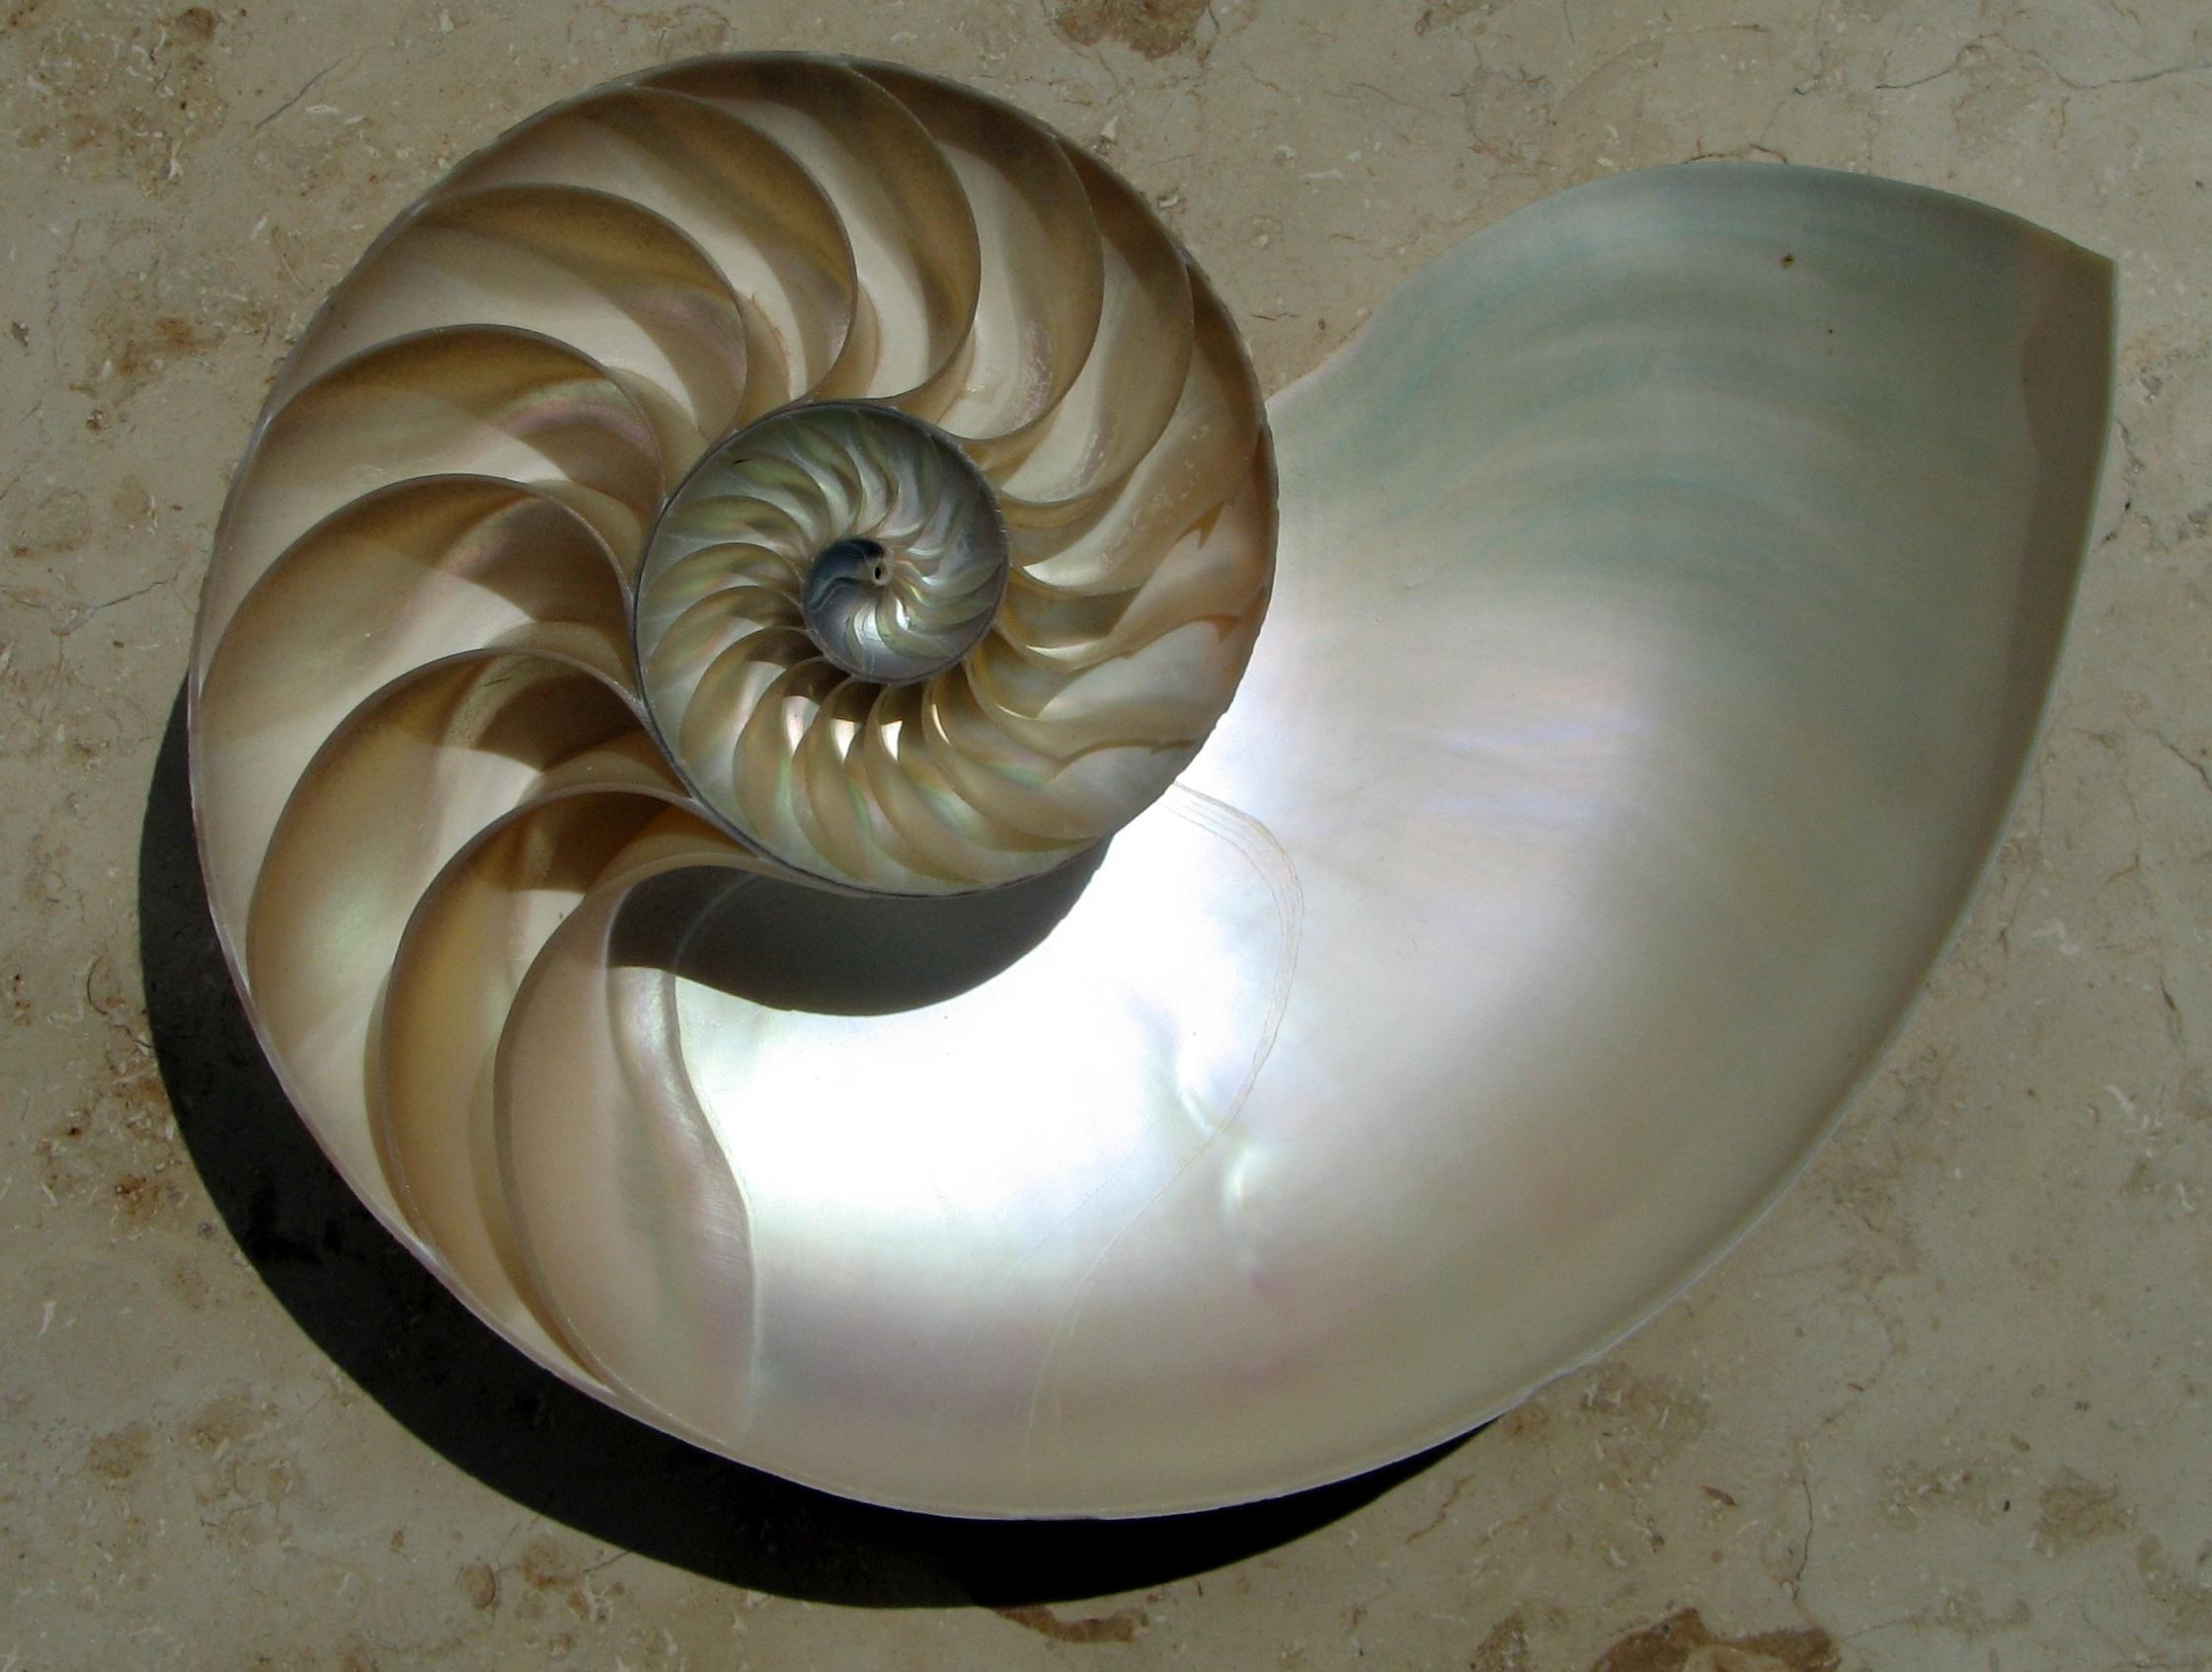 Chambered nautilus from Wikipedia Commons